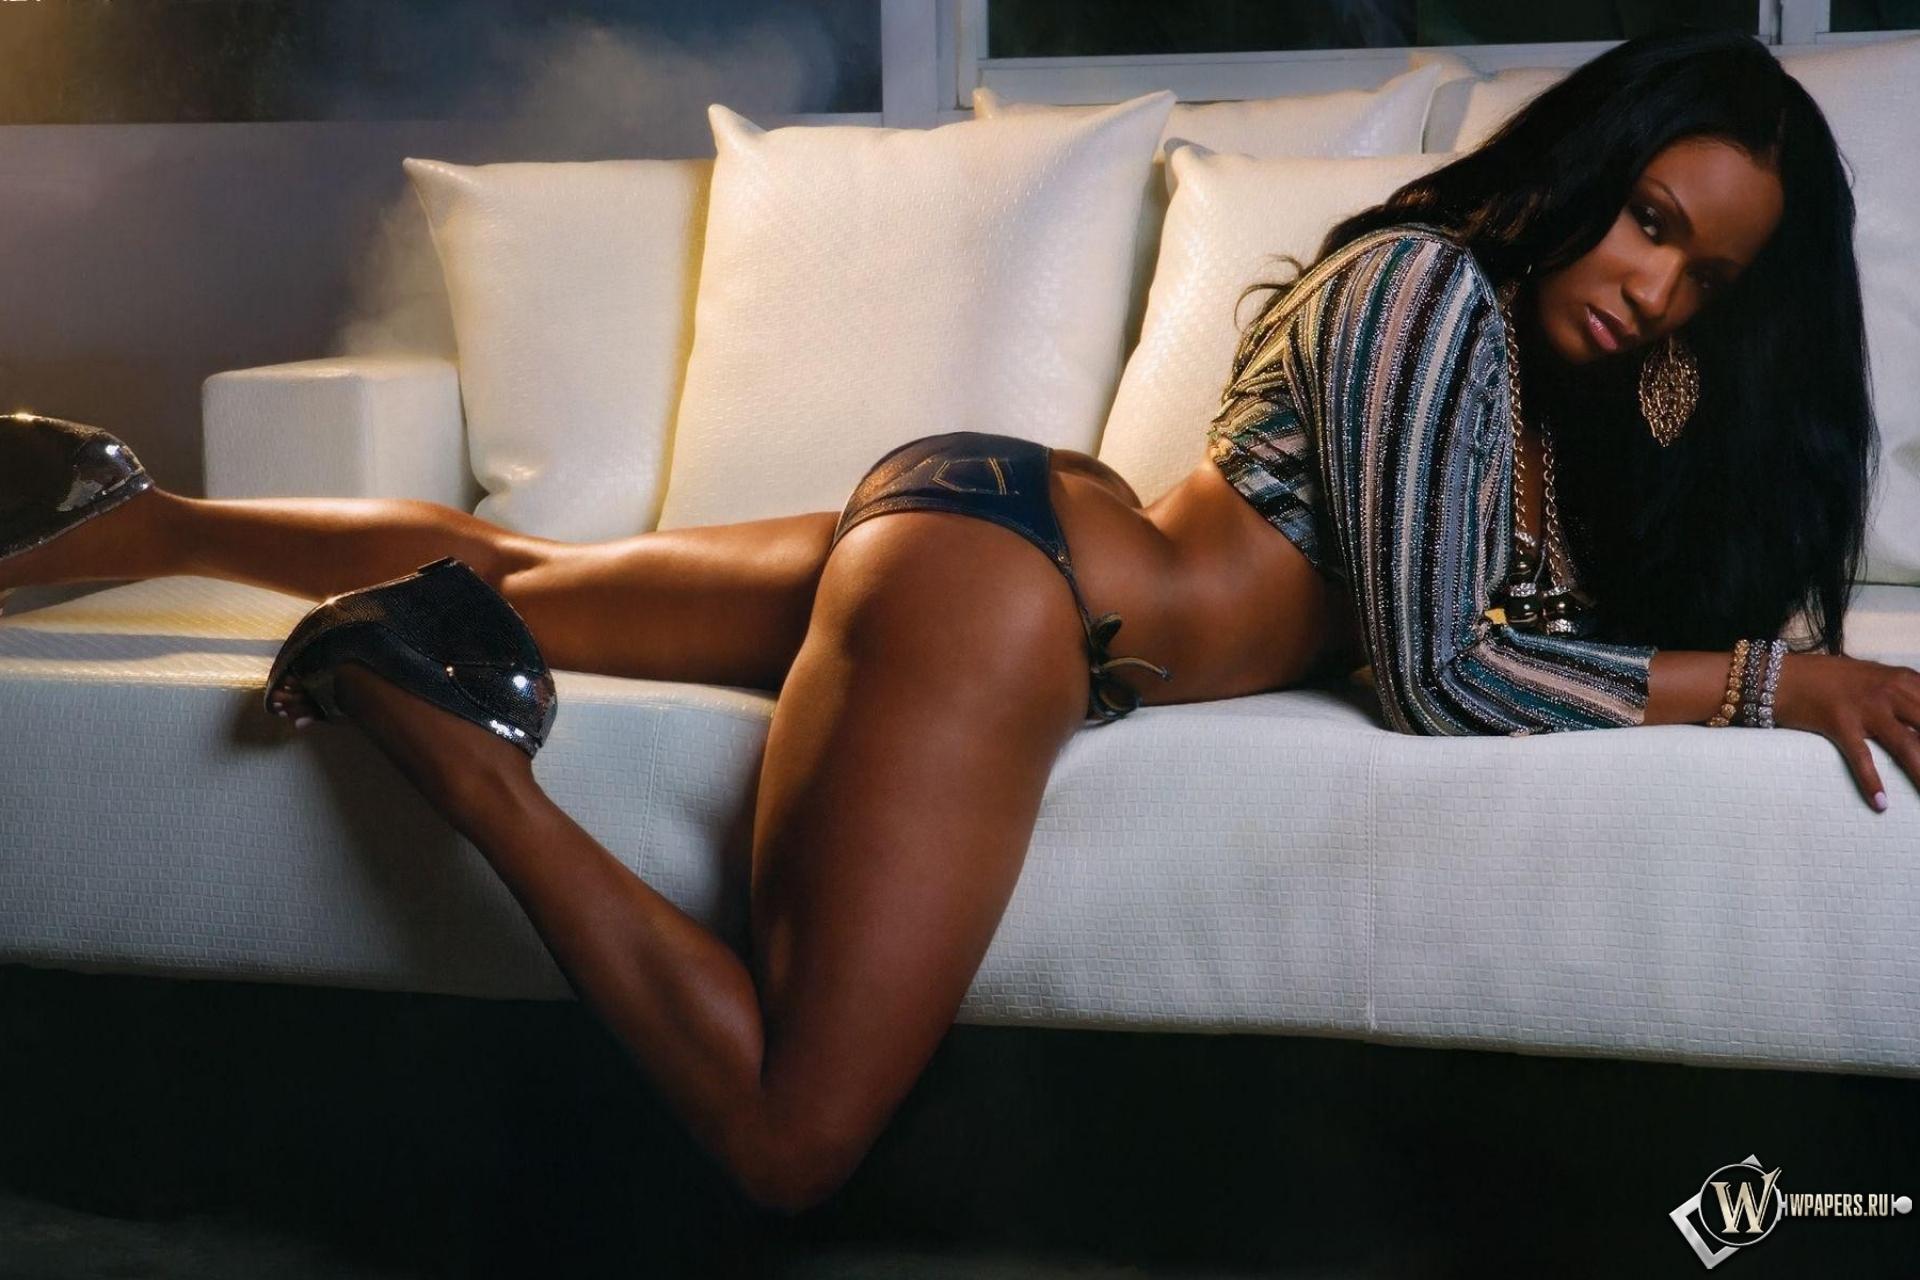 Трах на диван фото 10 фотография